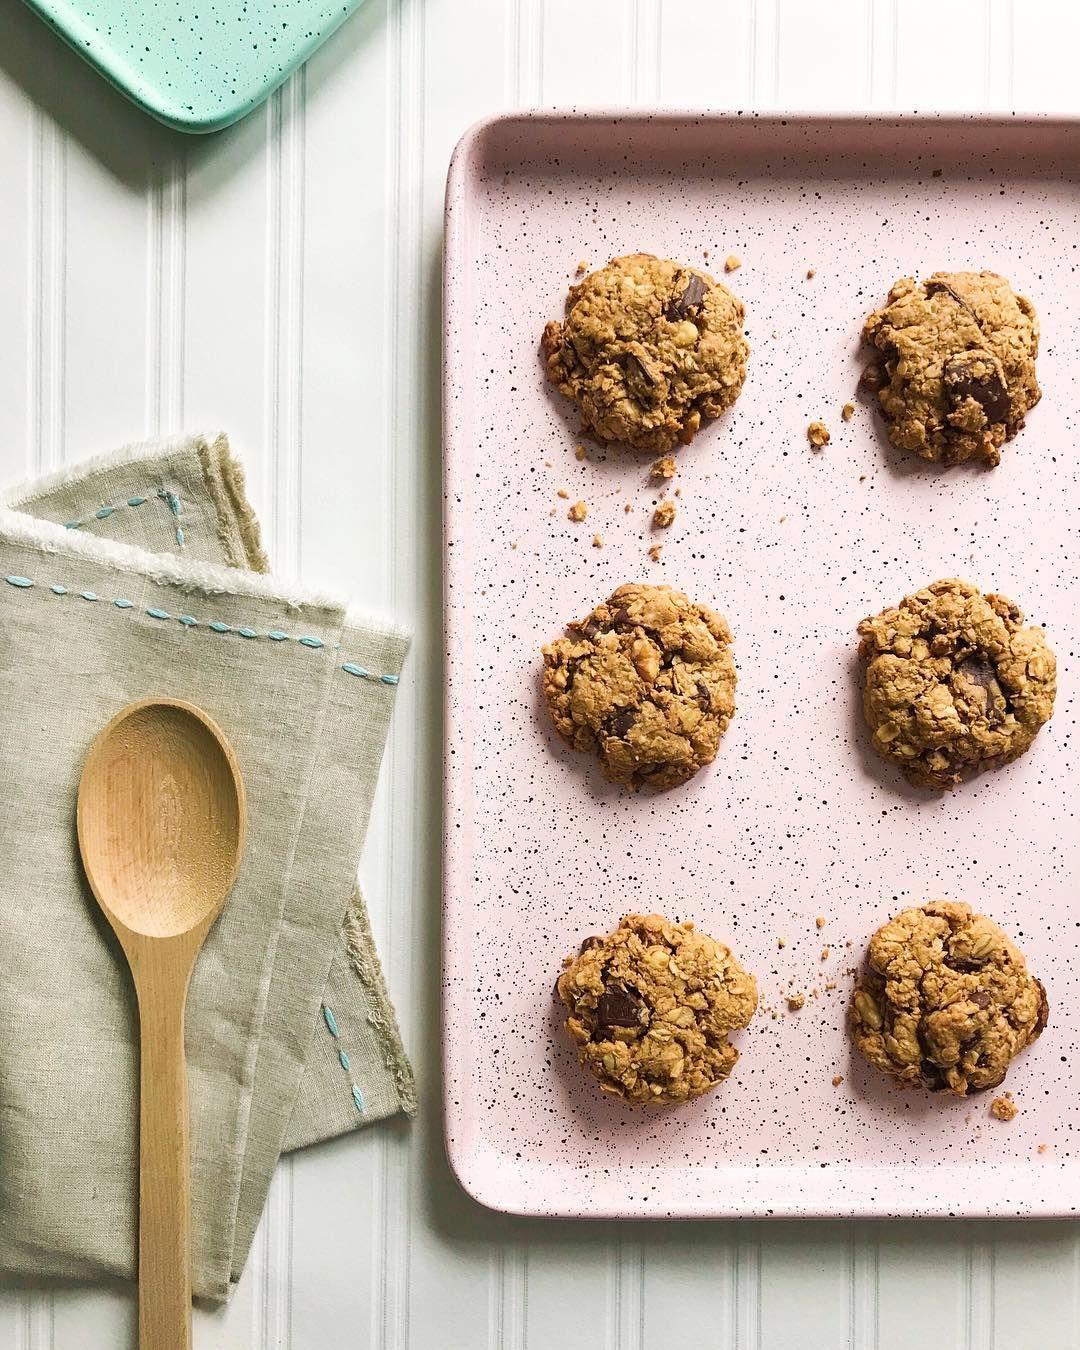 Samantha Pynn On Instagram Spent The Afternoon Baking